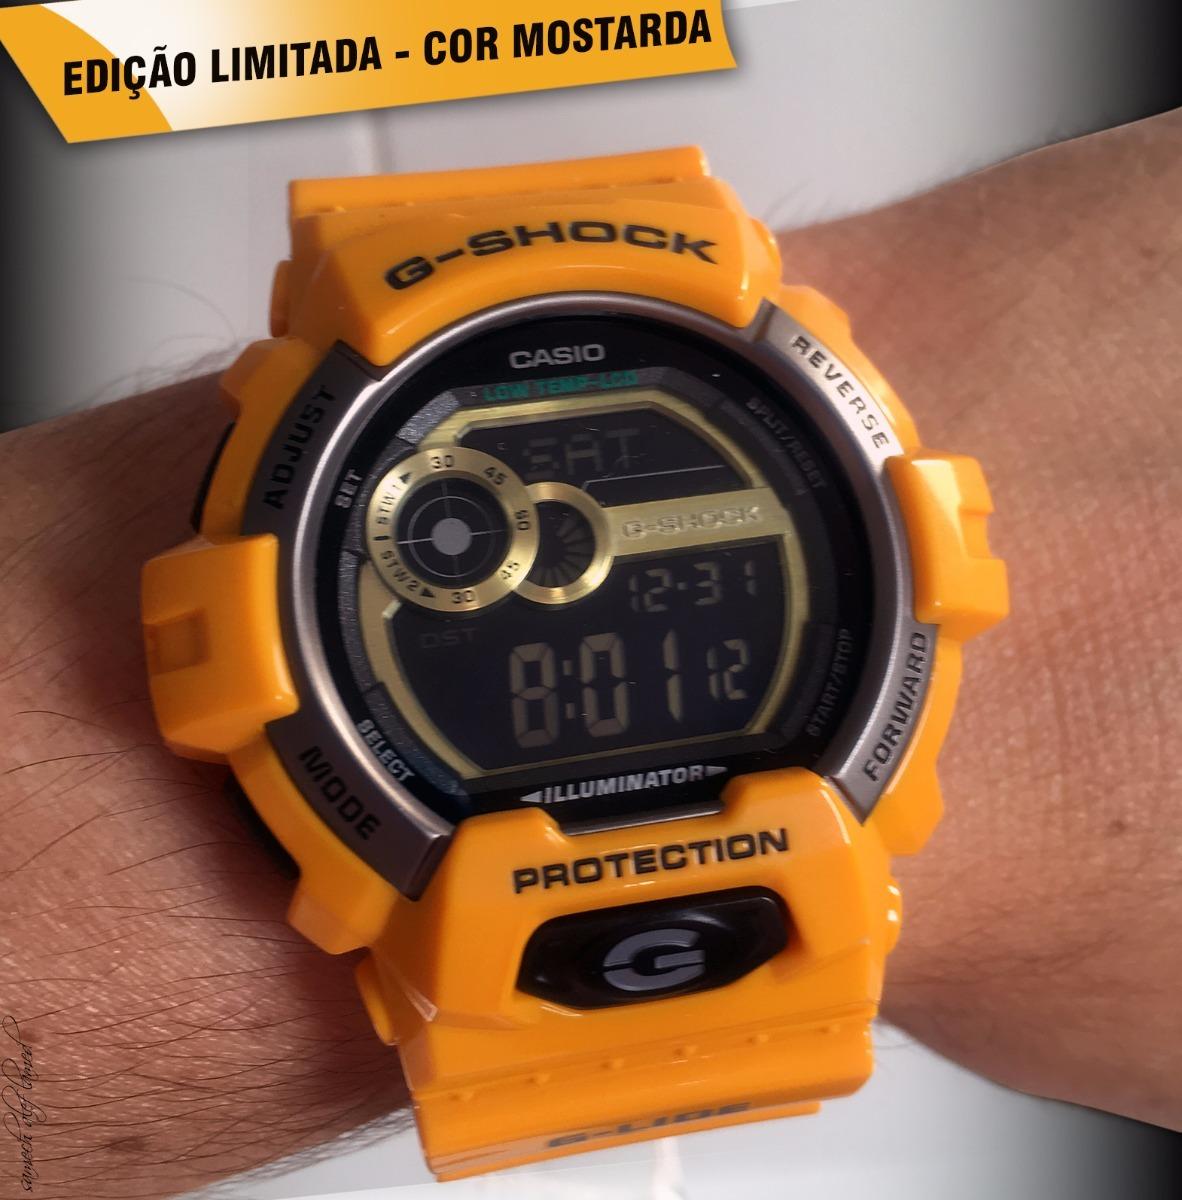 631b95fb1a4 Relógio Casio G-shock Glx-8900-9dr - R  529